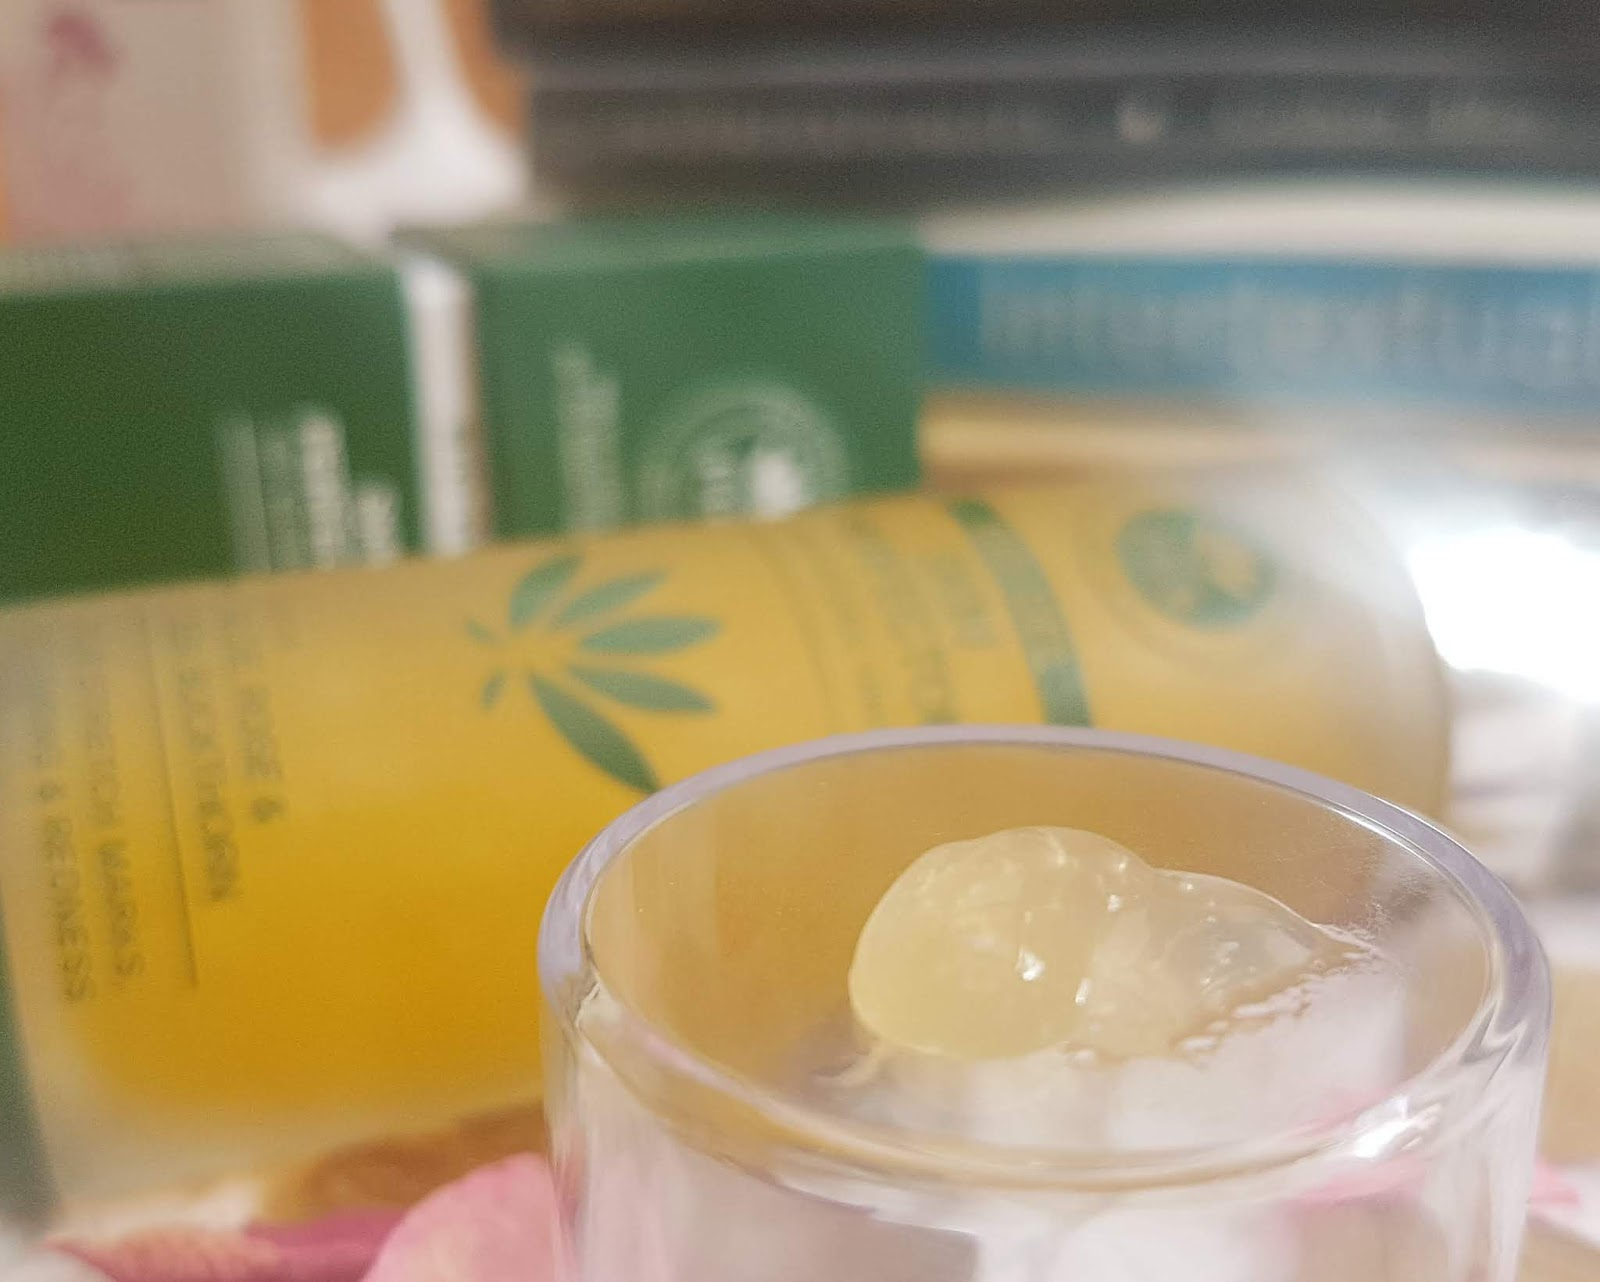 PHB Skin Perfector Bio Gel texture